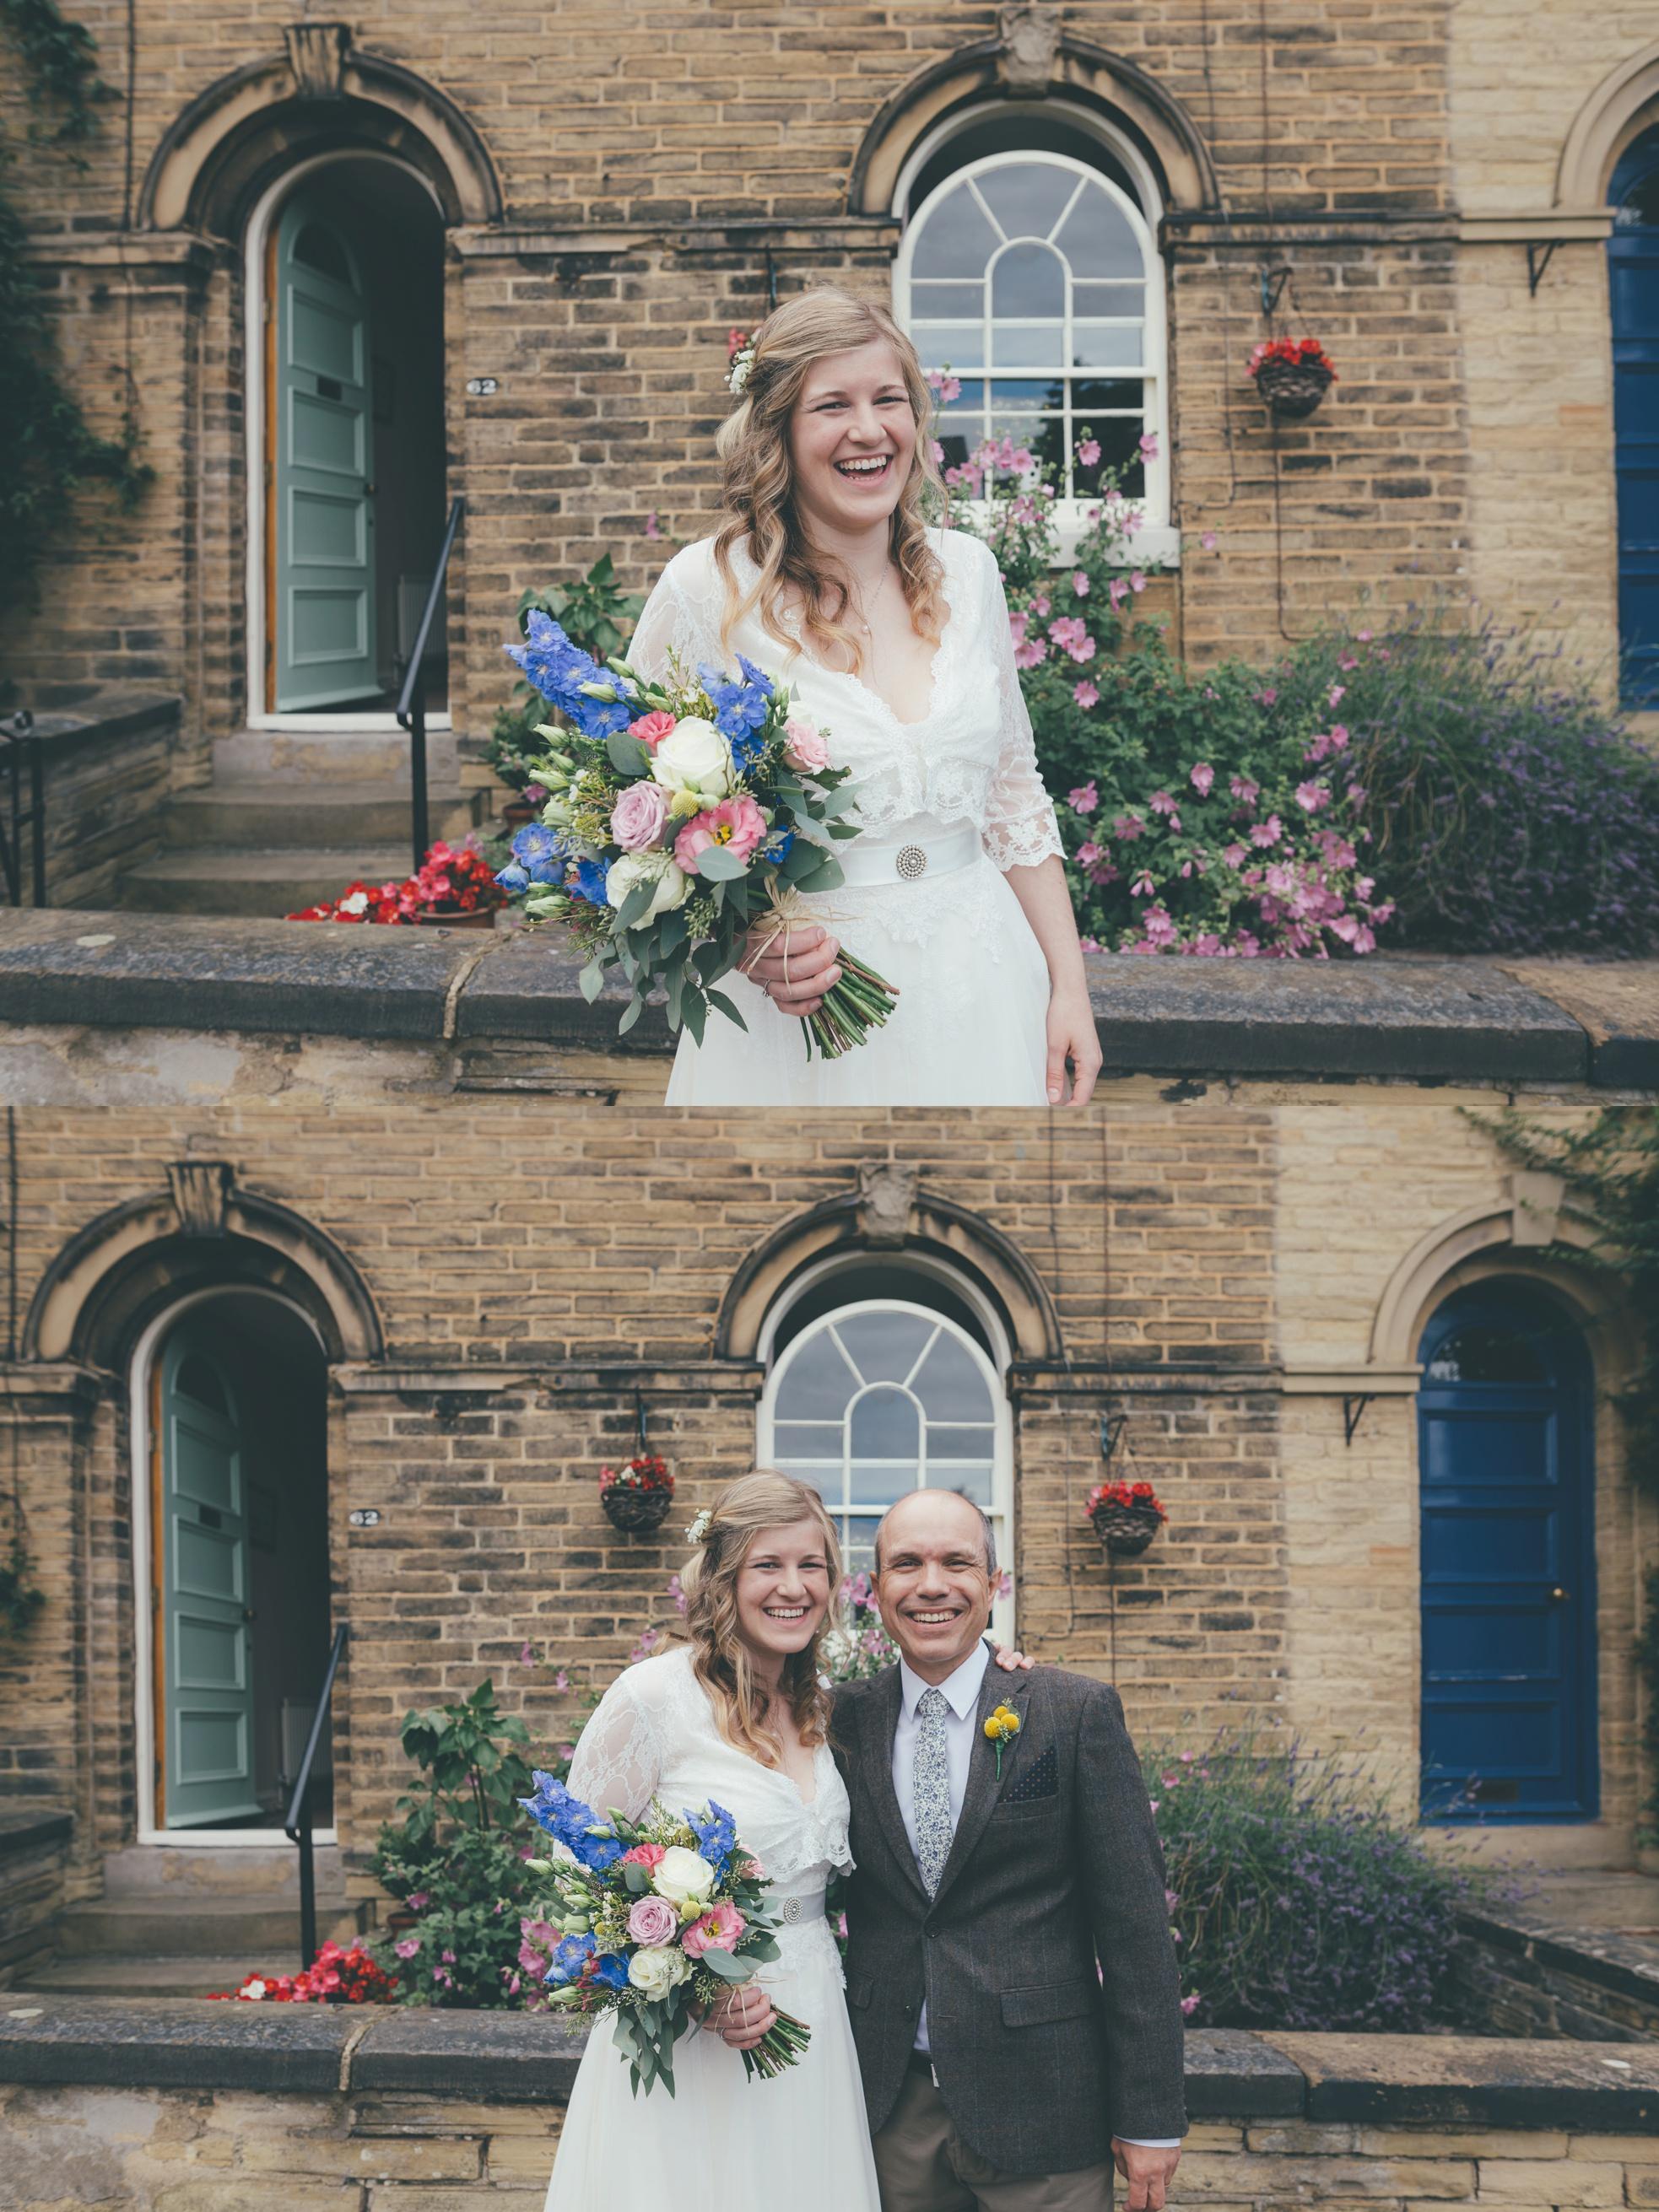 Matt&Mayme_LinehamFarmLeeds_0009.jpg